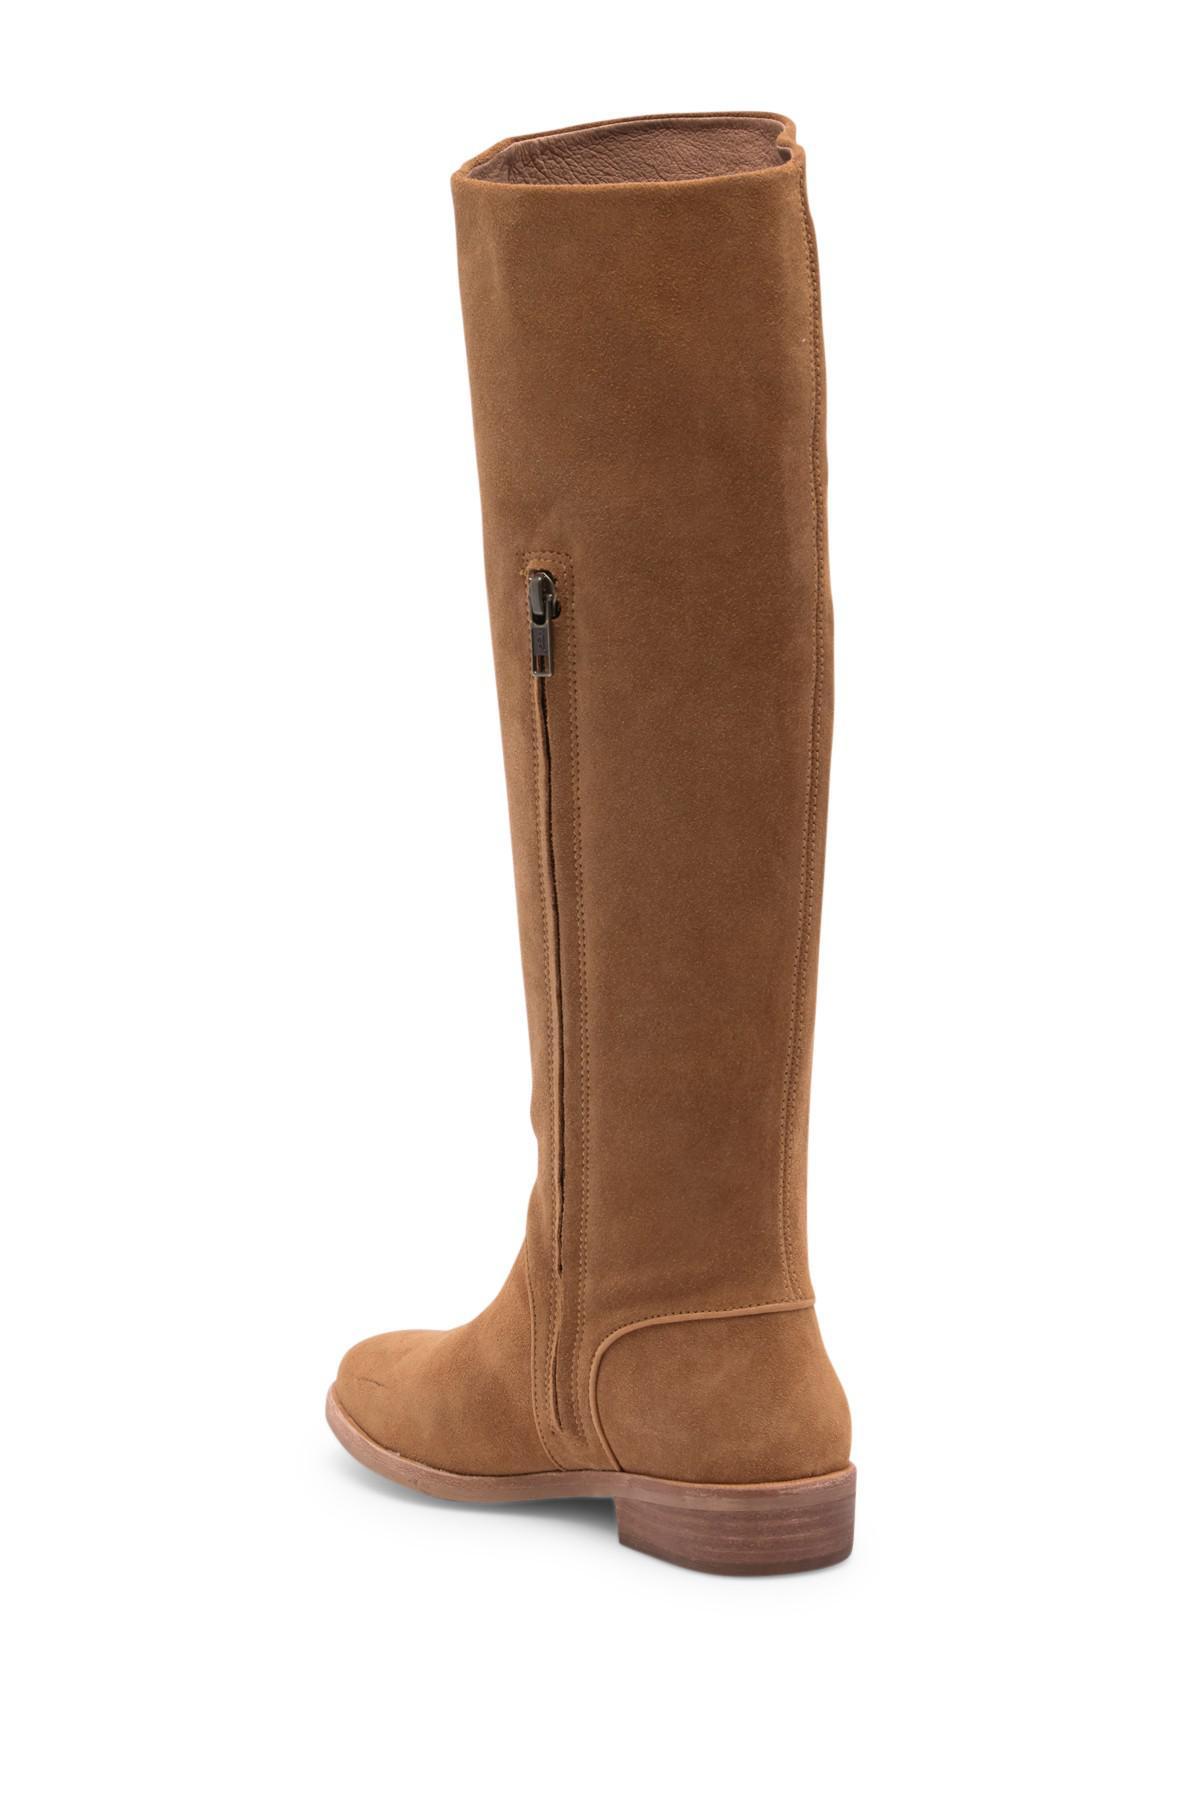 3bbc3fce4de Lyst - UGG (r) Daley Tall Boot (women) in Brown